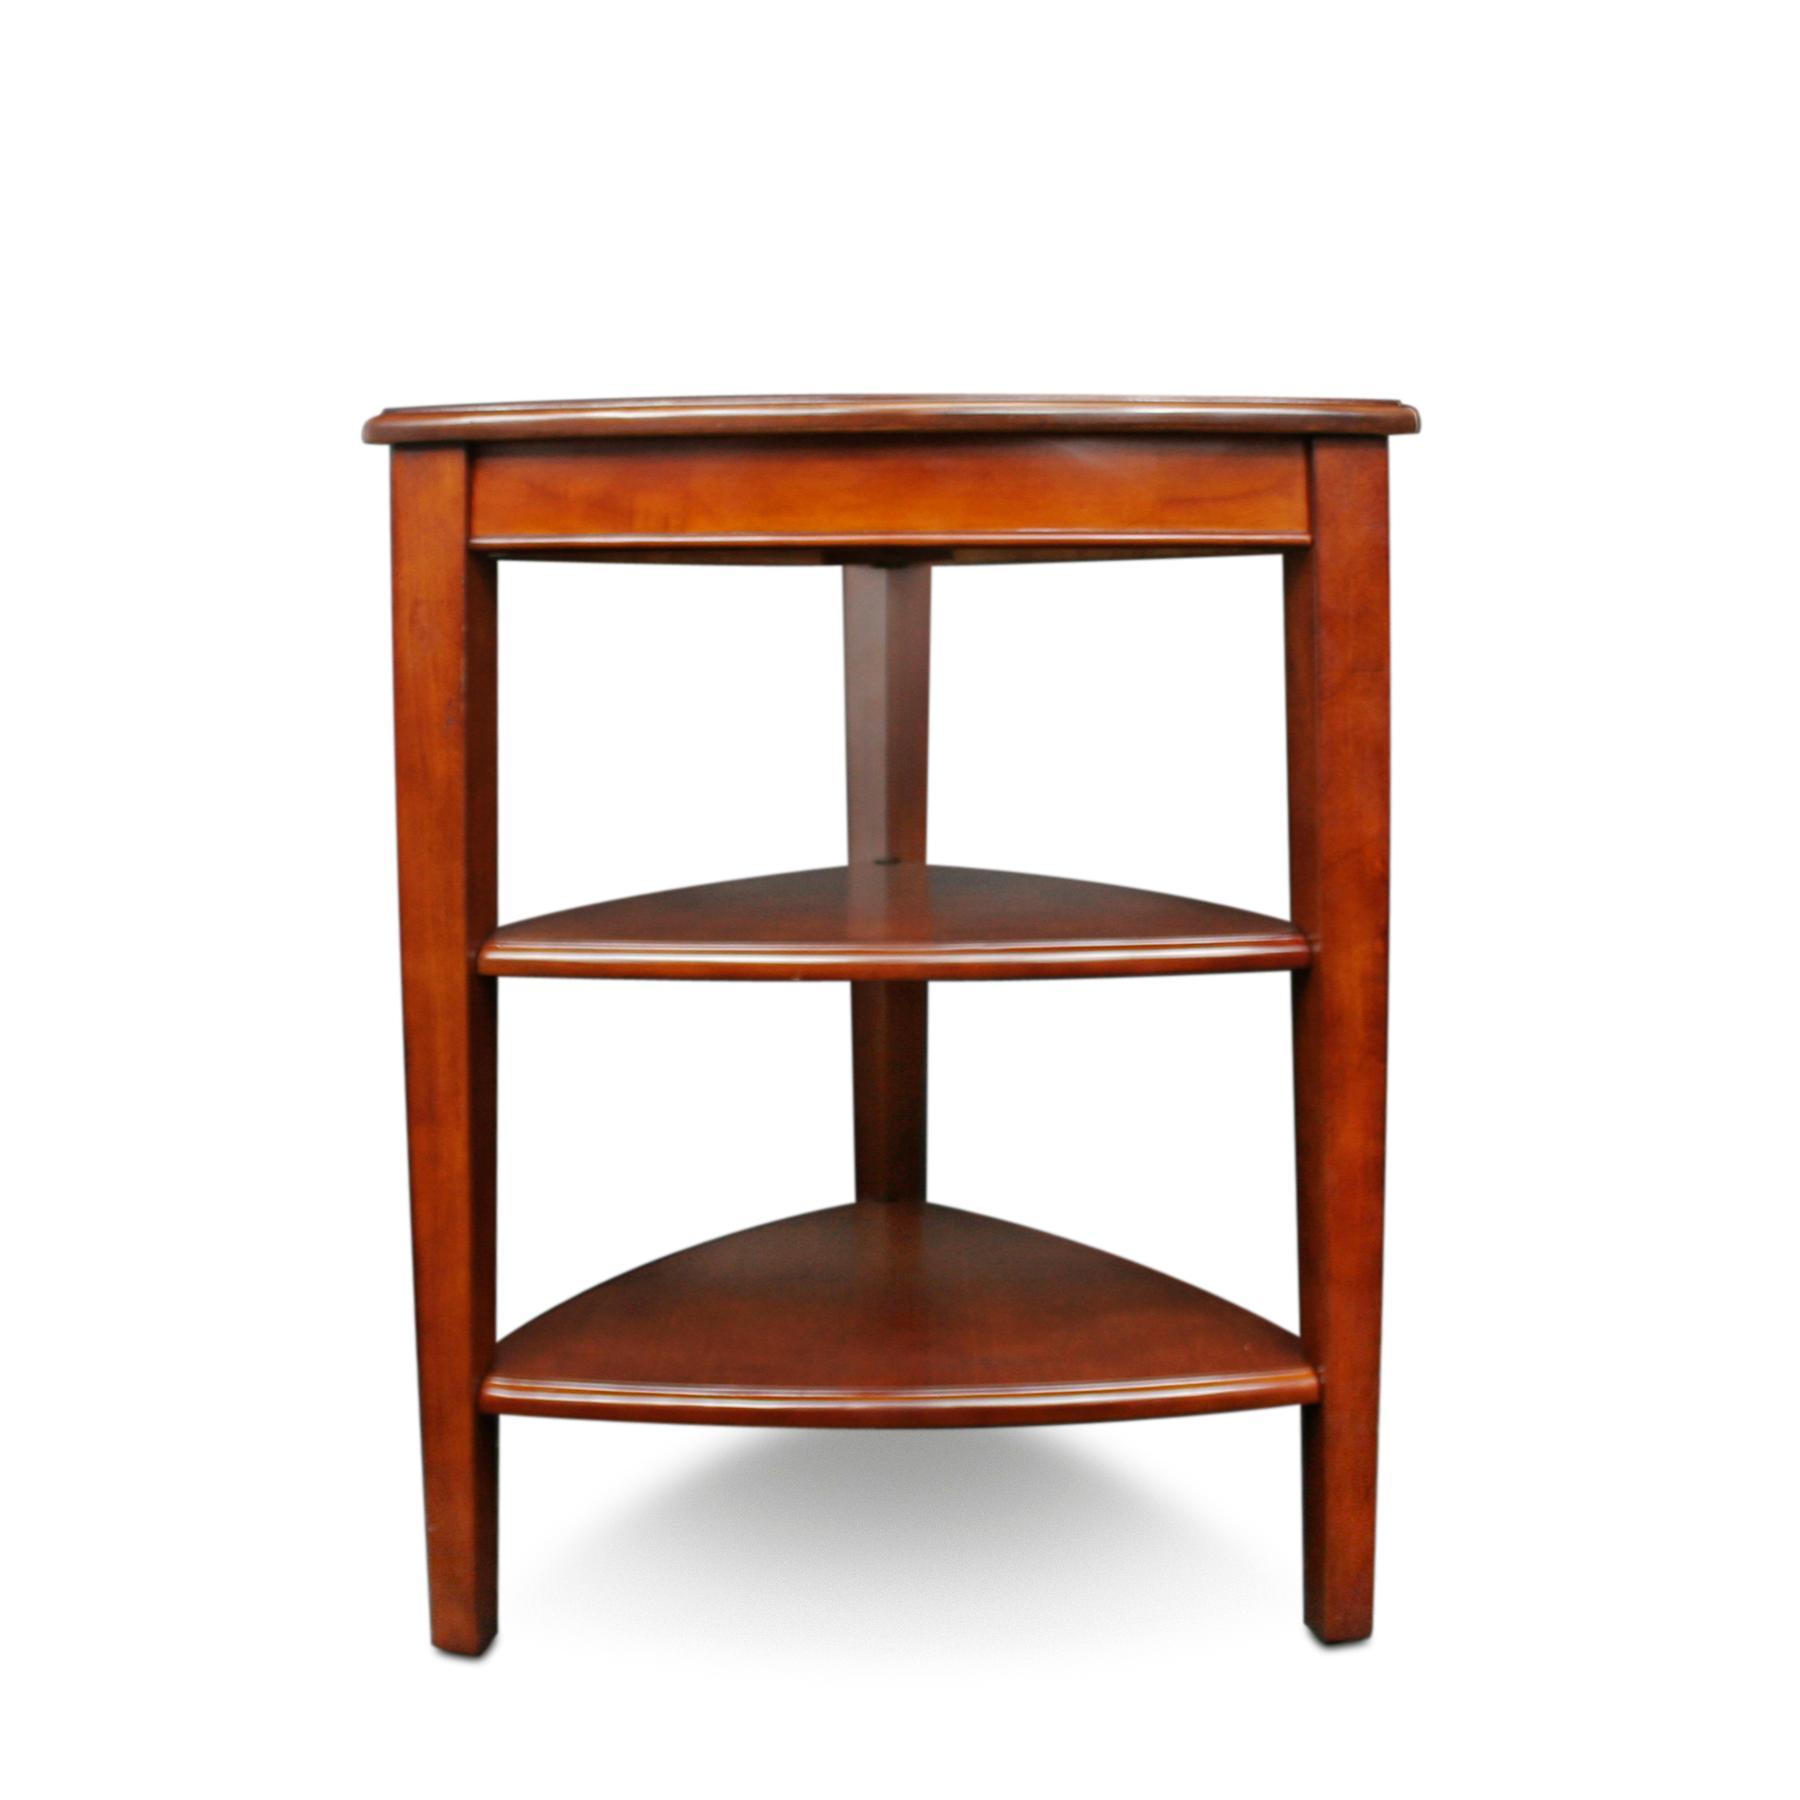 side tables, end tables, living room furniture